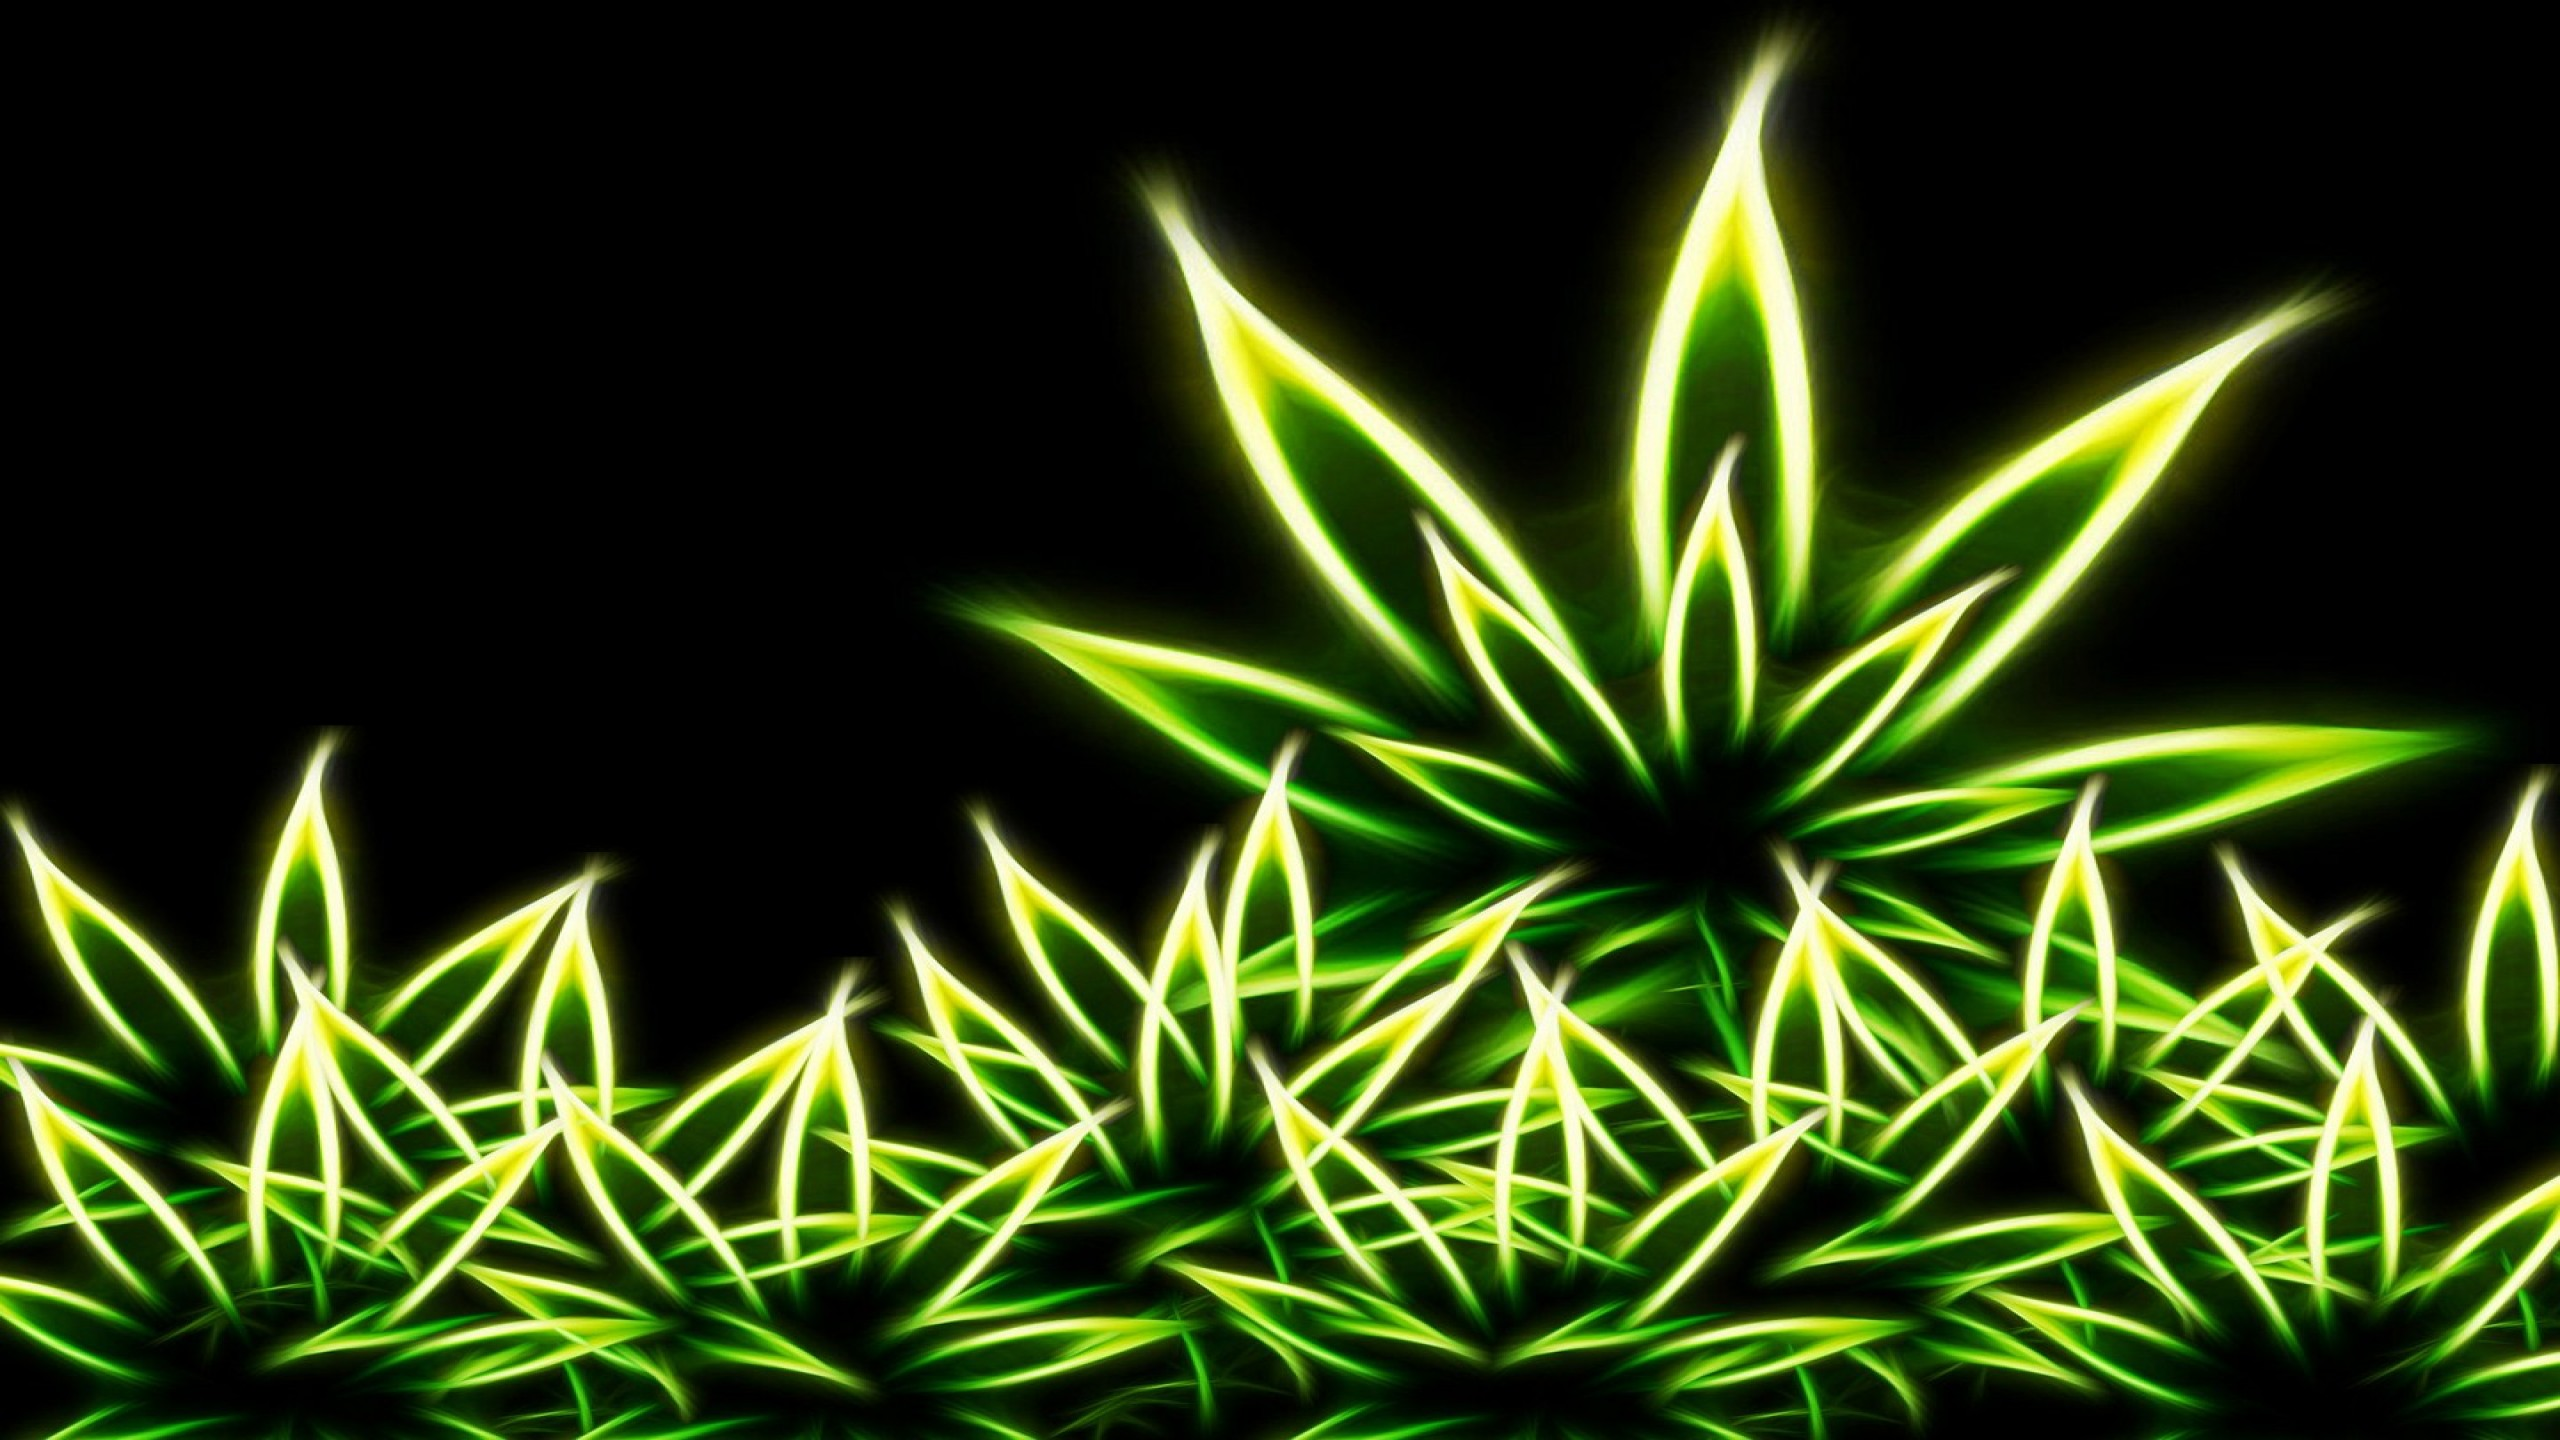 Marijuana Wallpaper - WallpaperSafari